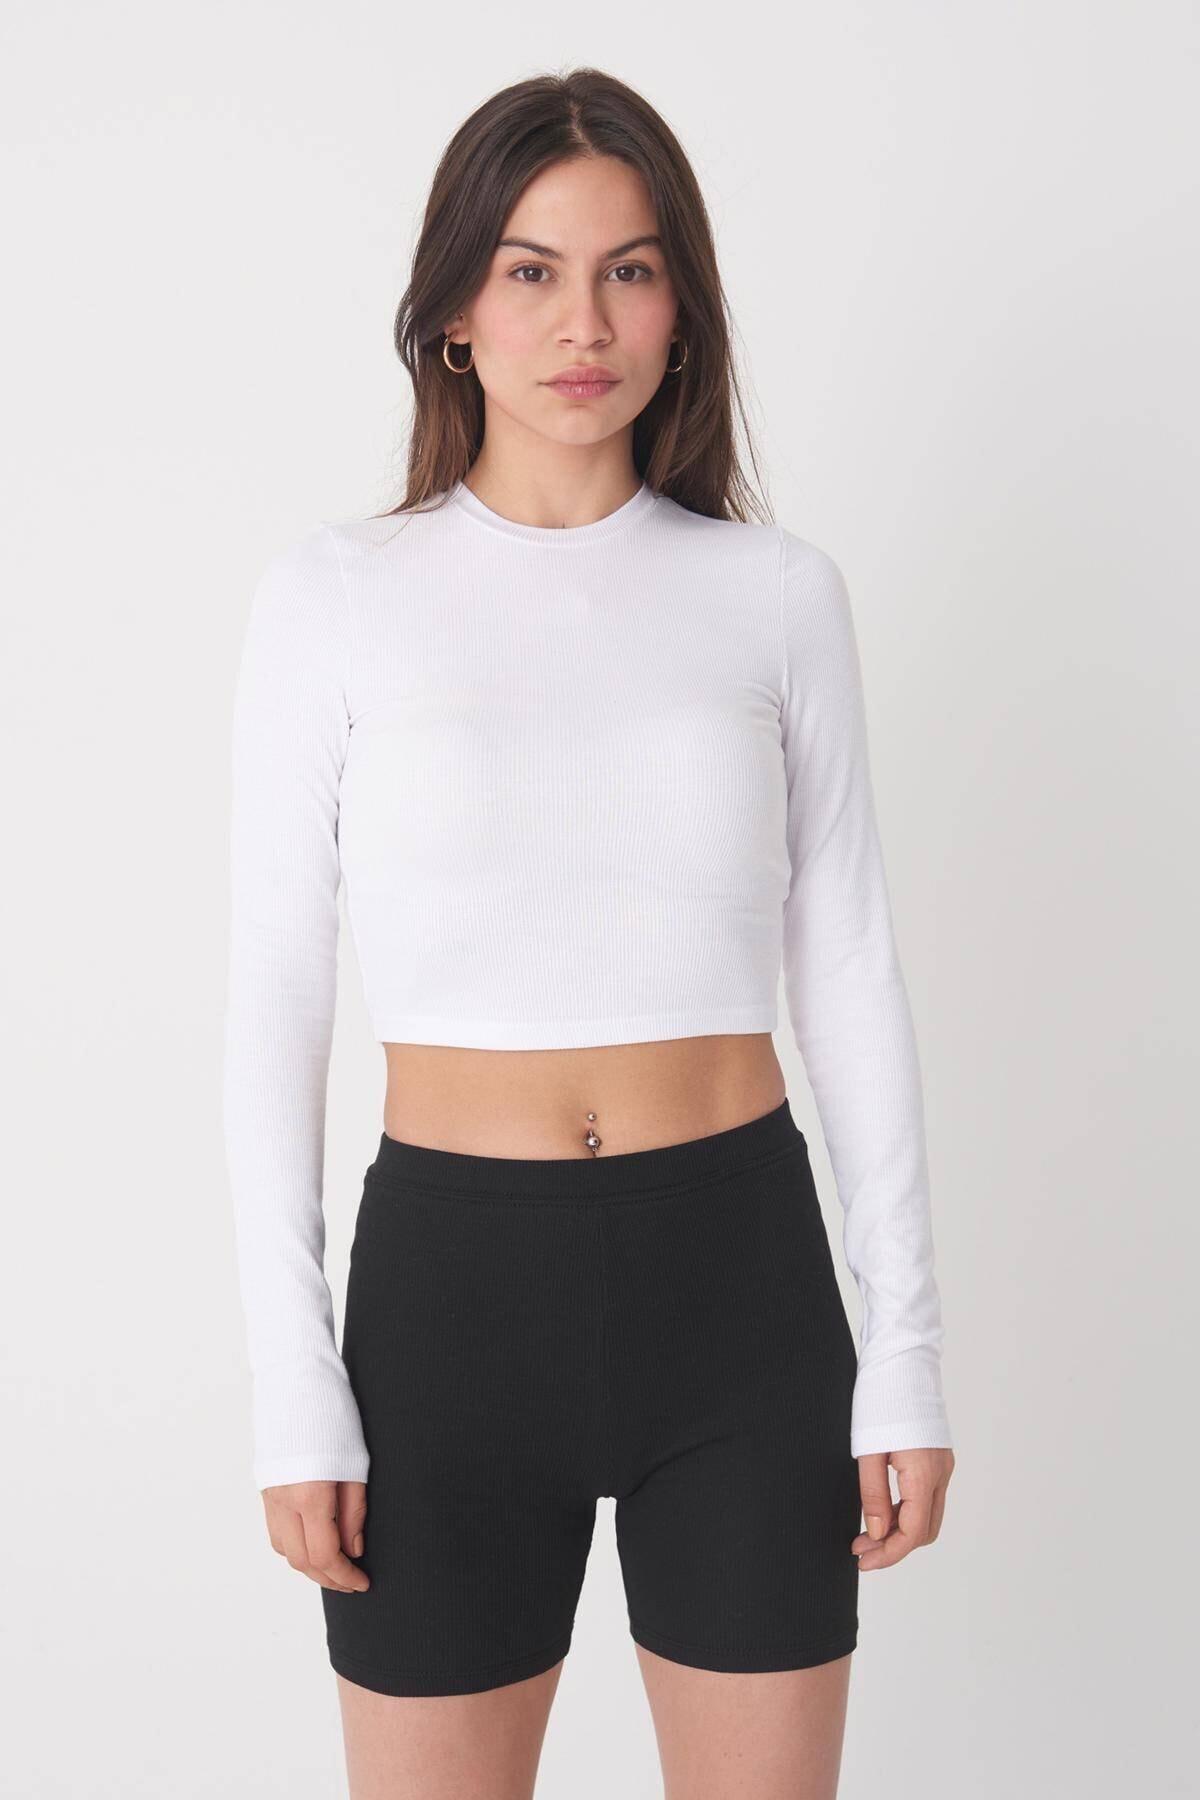 Addax Kadın Beyaz Uzun Kollu Bluz P1017 - K12 ADX-0000022662 1